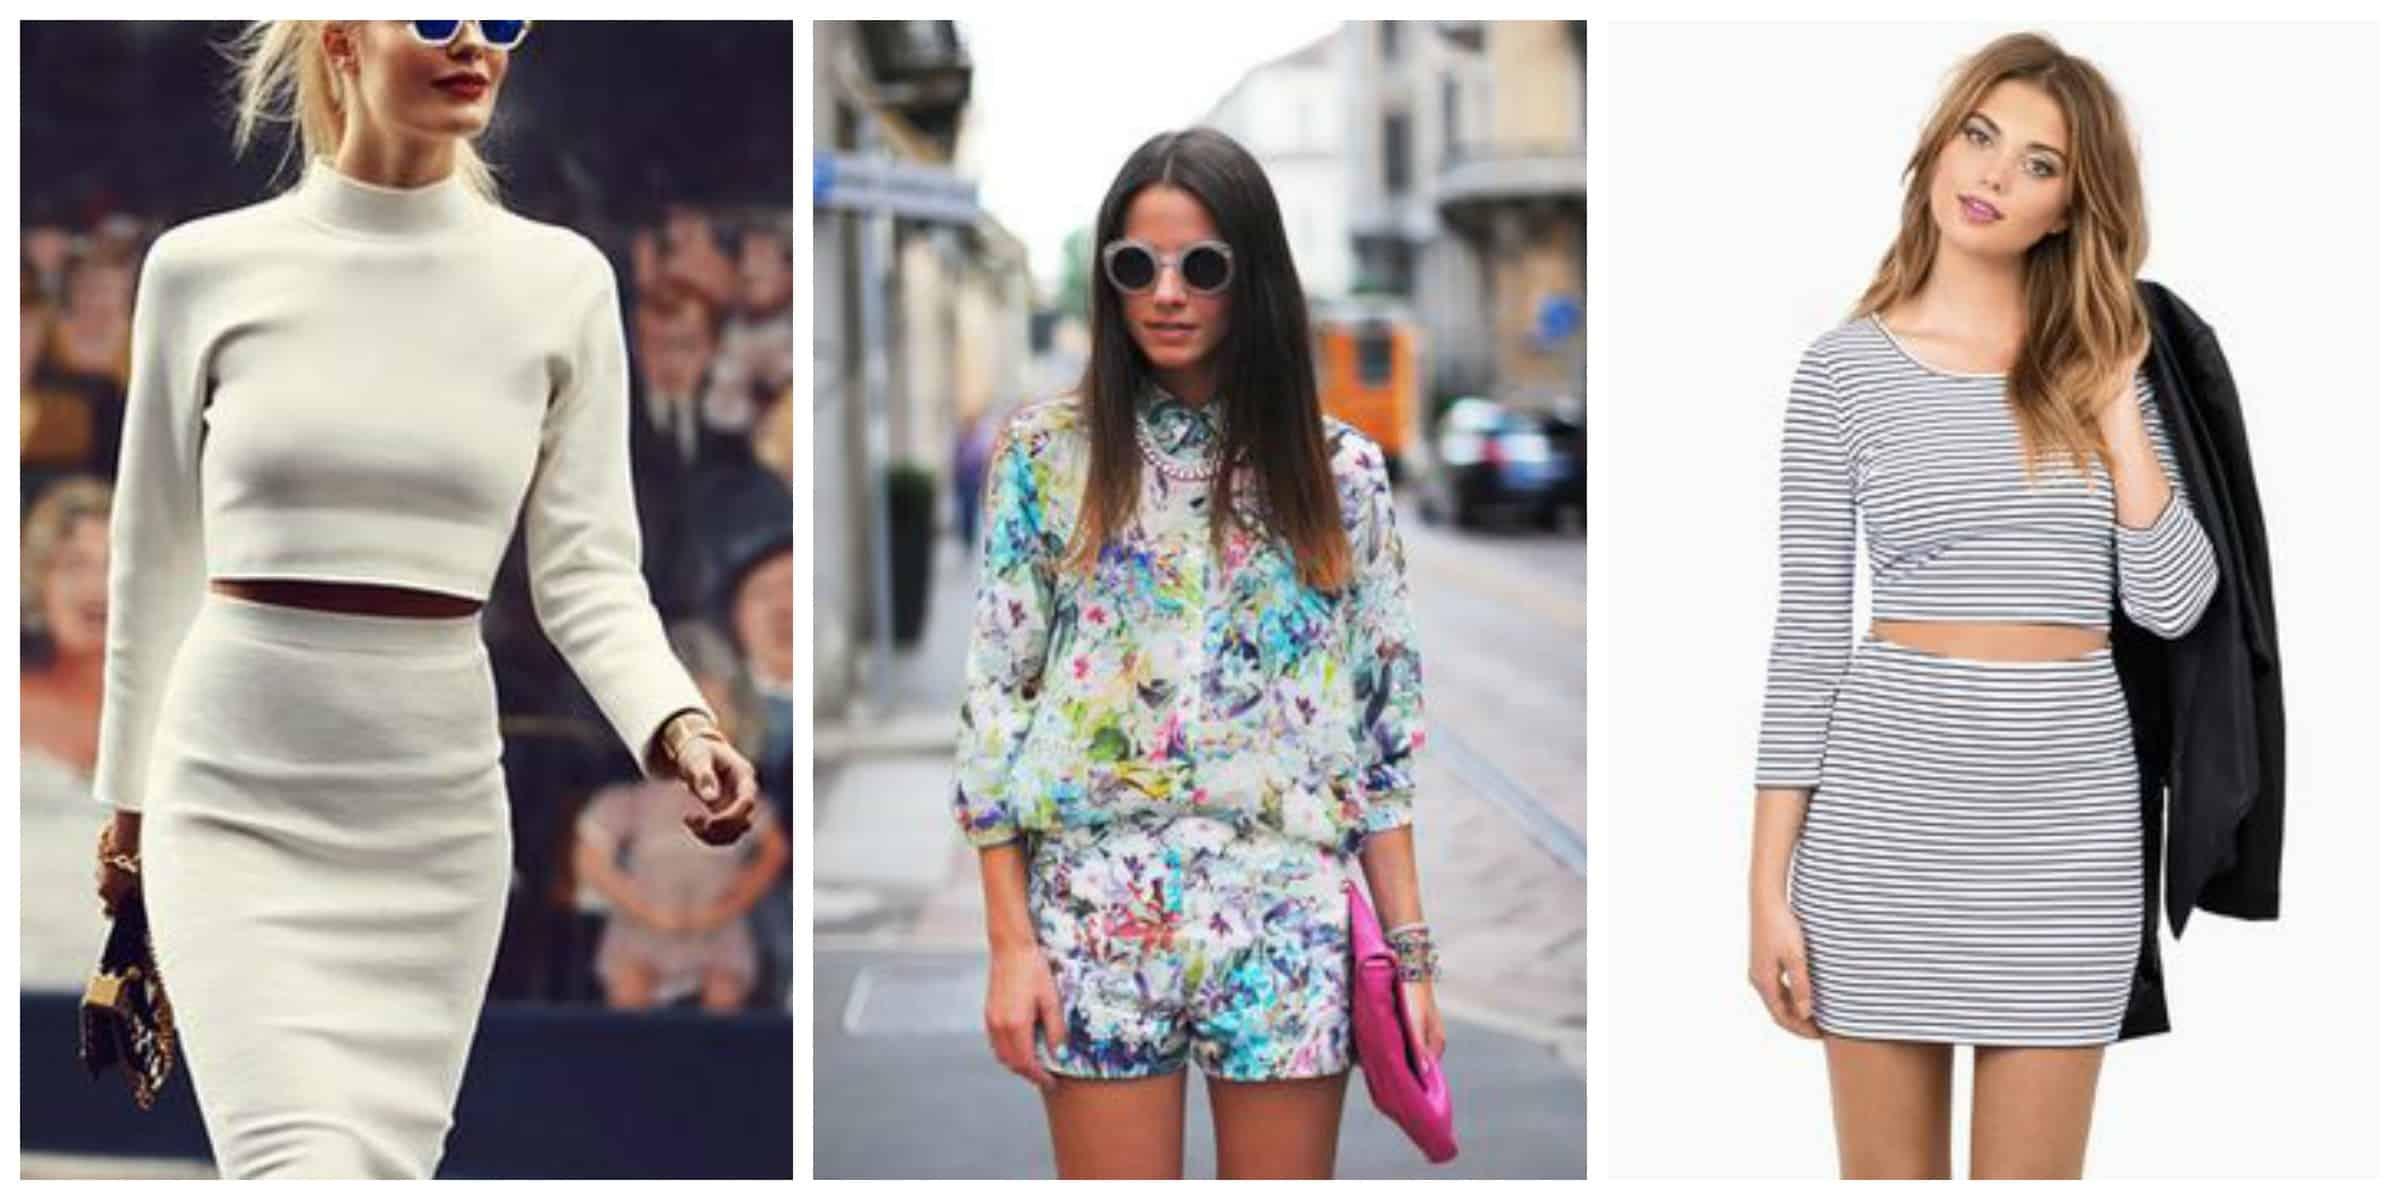 matchy-matchy-sets-street-style-trend-2015-2